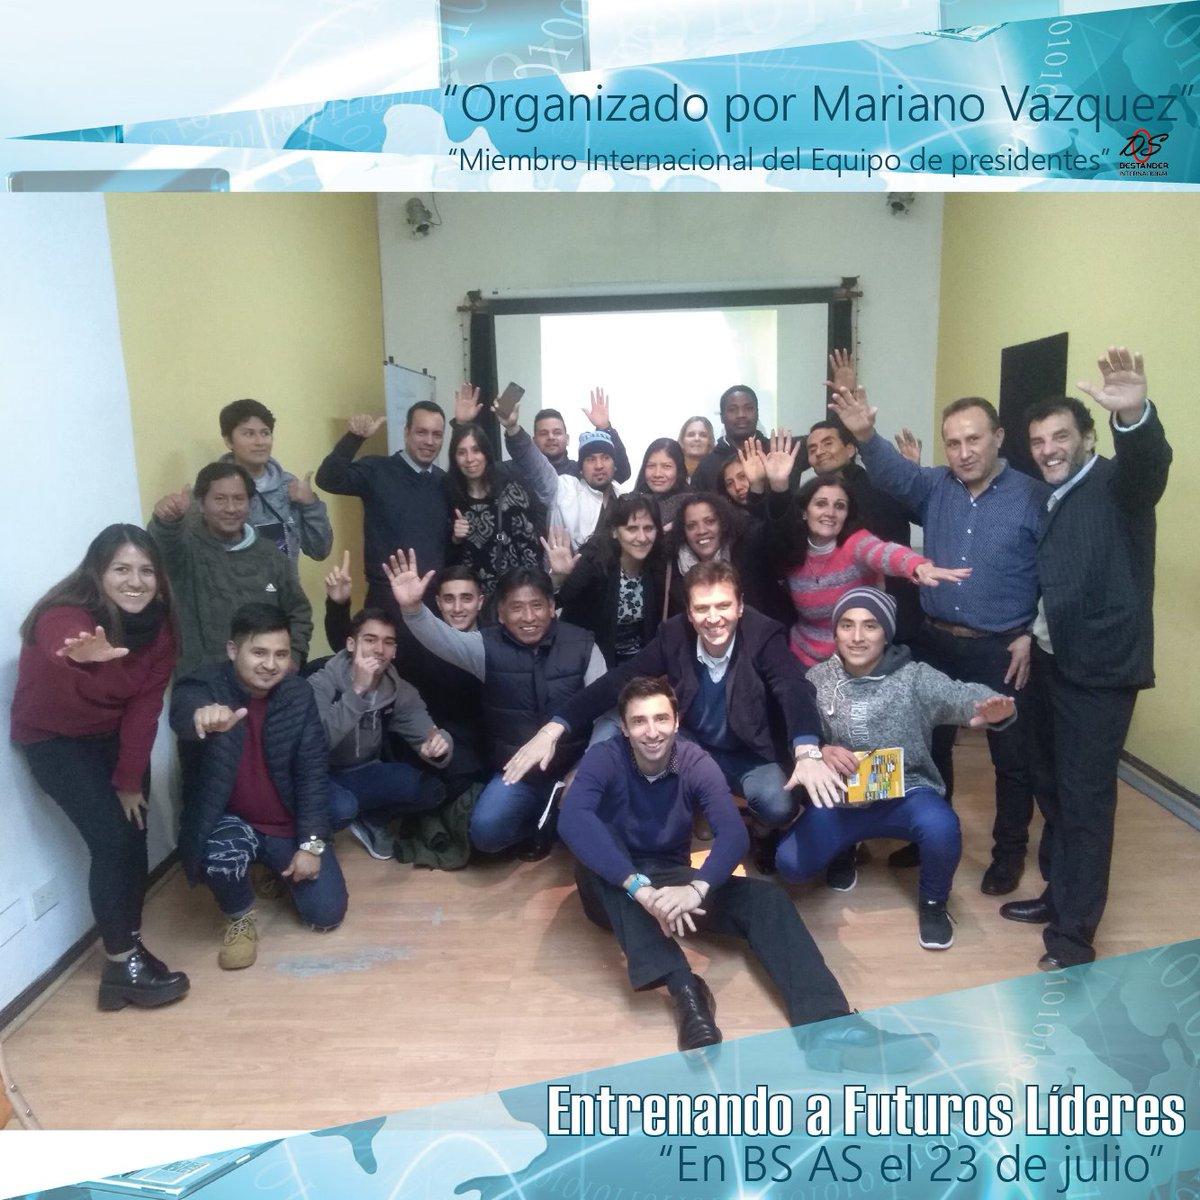 Entrenando a futuros líderes 👏👨💼  En Bs As 23 de julio 2018.  Organizado por Mariano Vazquez @MentorAlExito Miembro Internacional del Equipo de Presidentes DS Internacional https://t.co/pDIzwOePDW